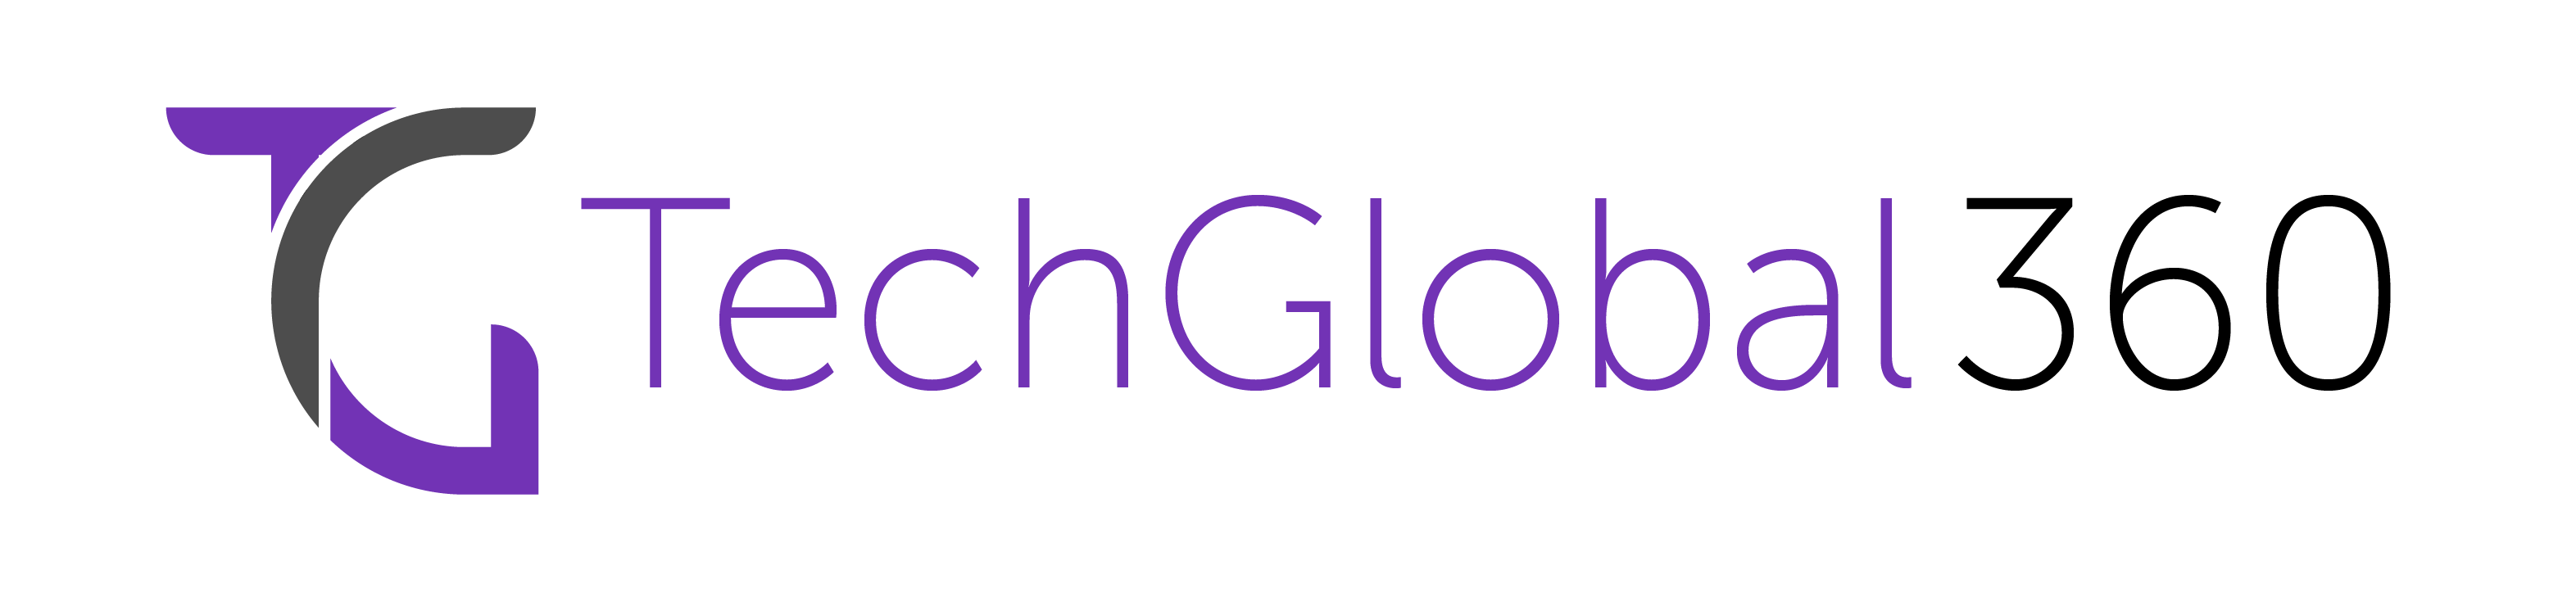 #1 Globally Awarded 360° Digital Technology Marketing Agency